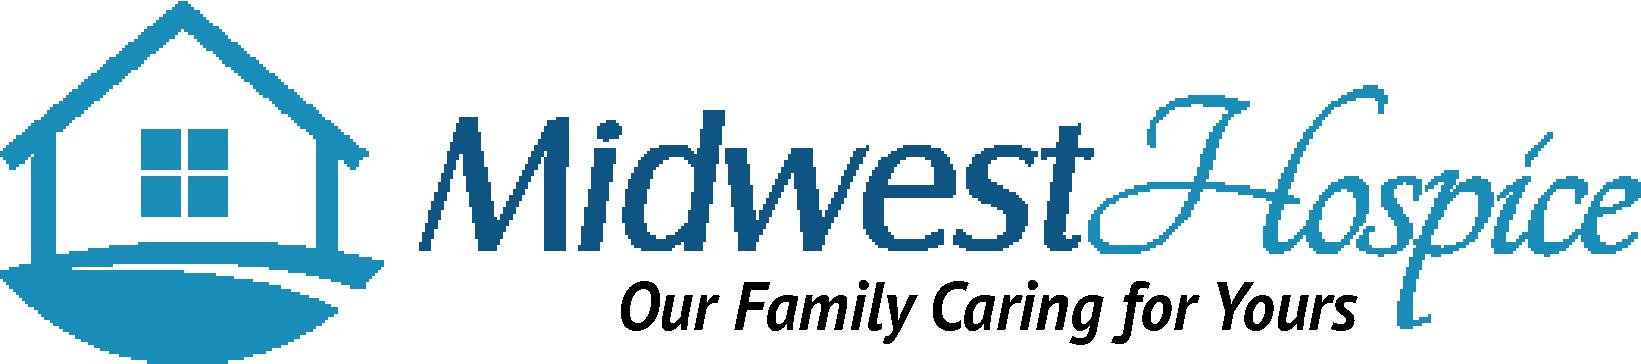 Midwest Hospice | Serving Greater Cincinnati